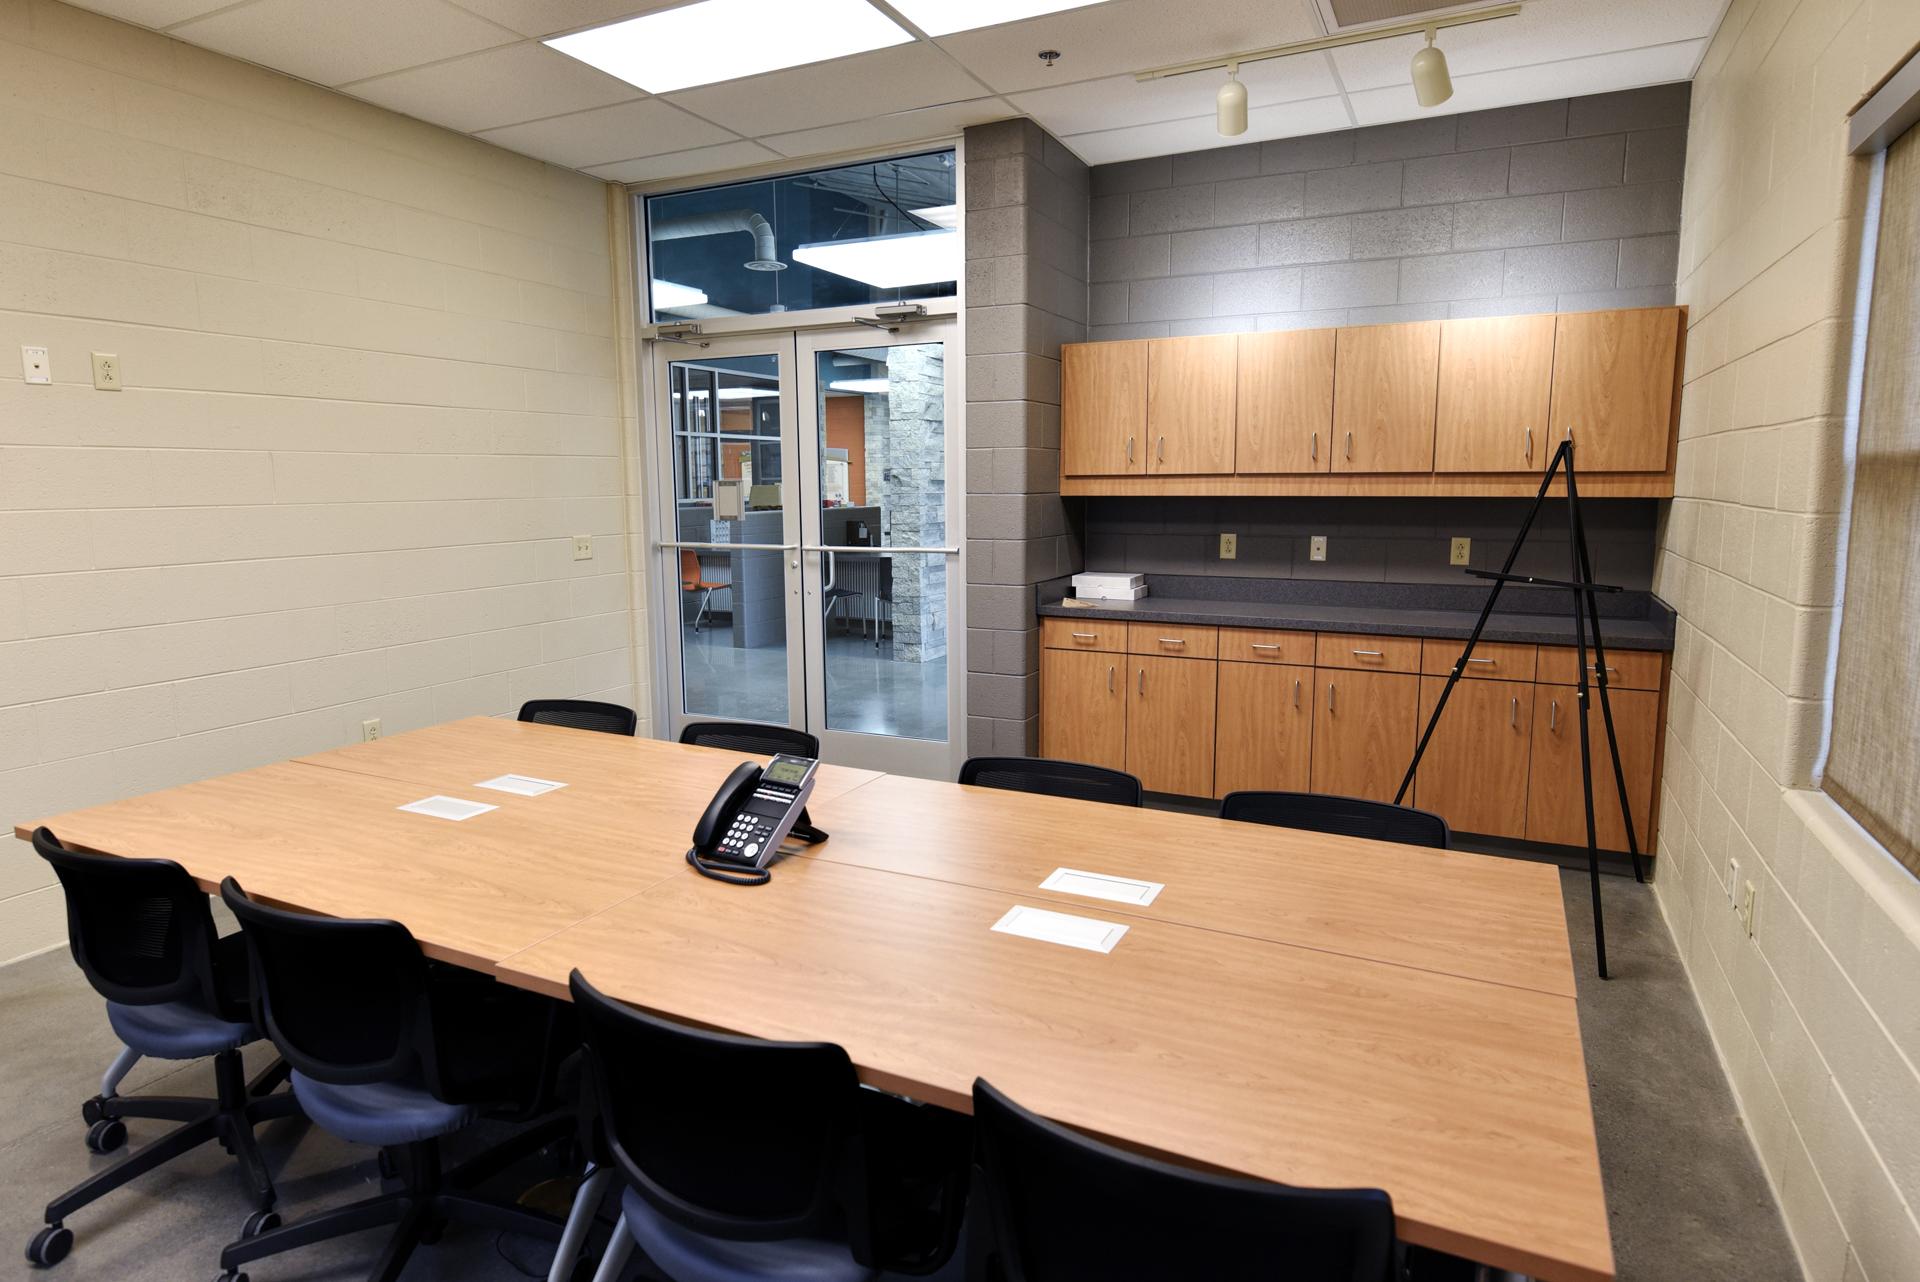 Training/Meeting Room